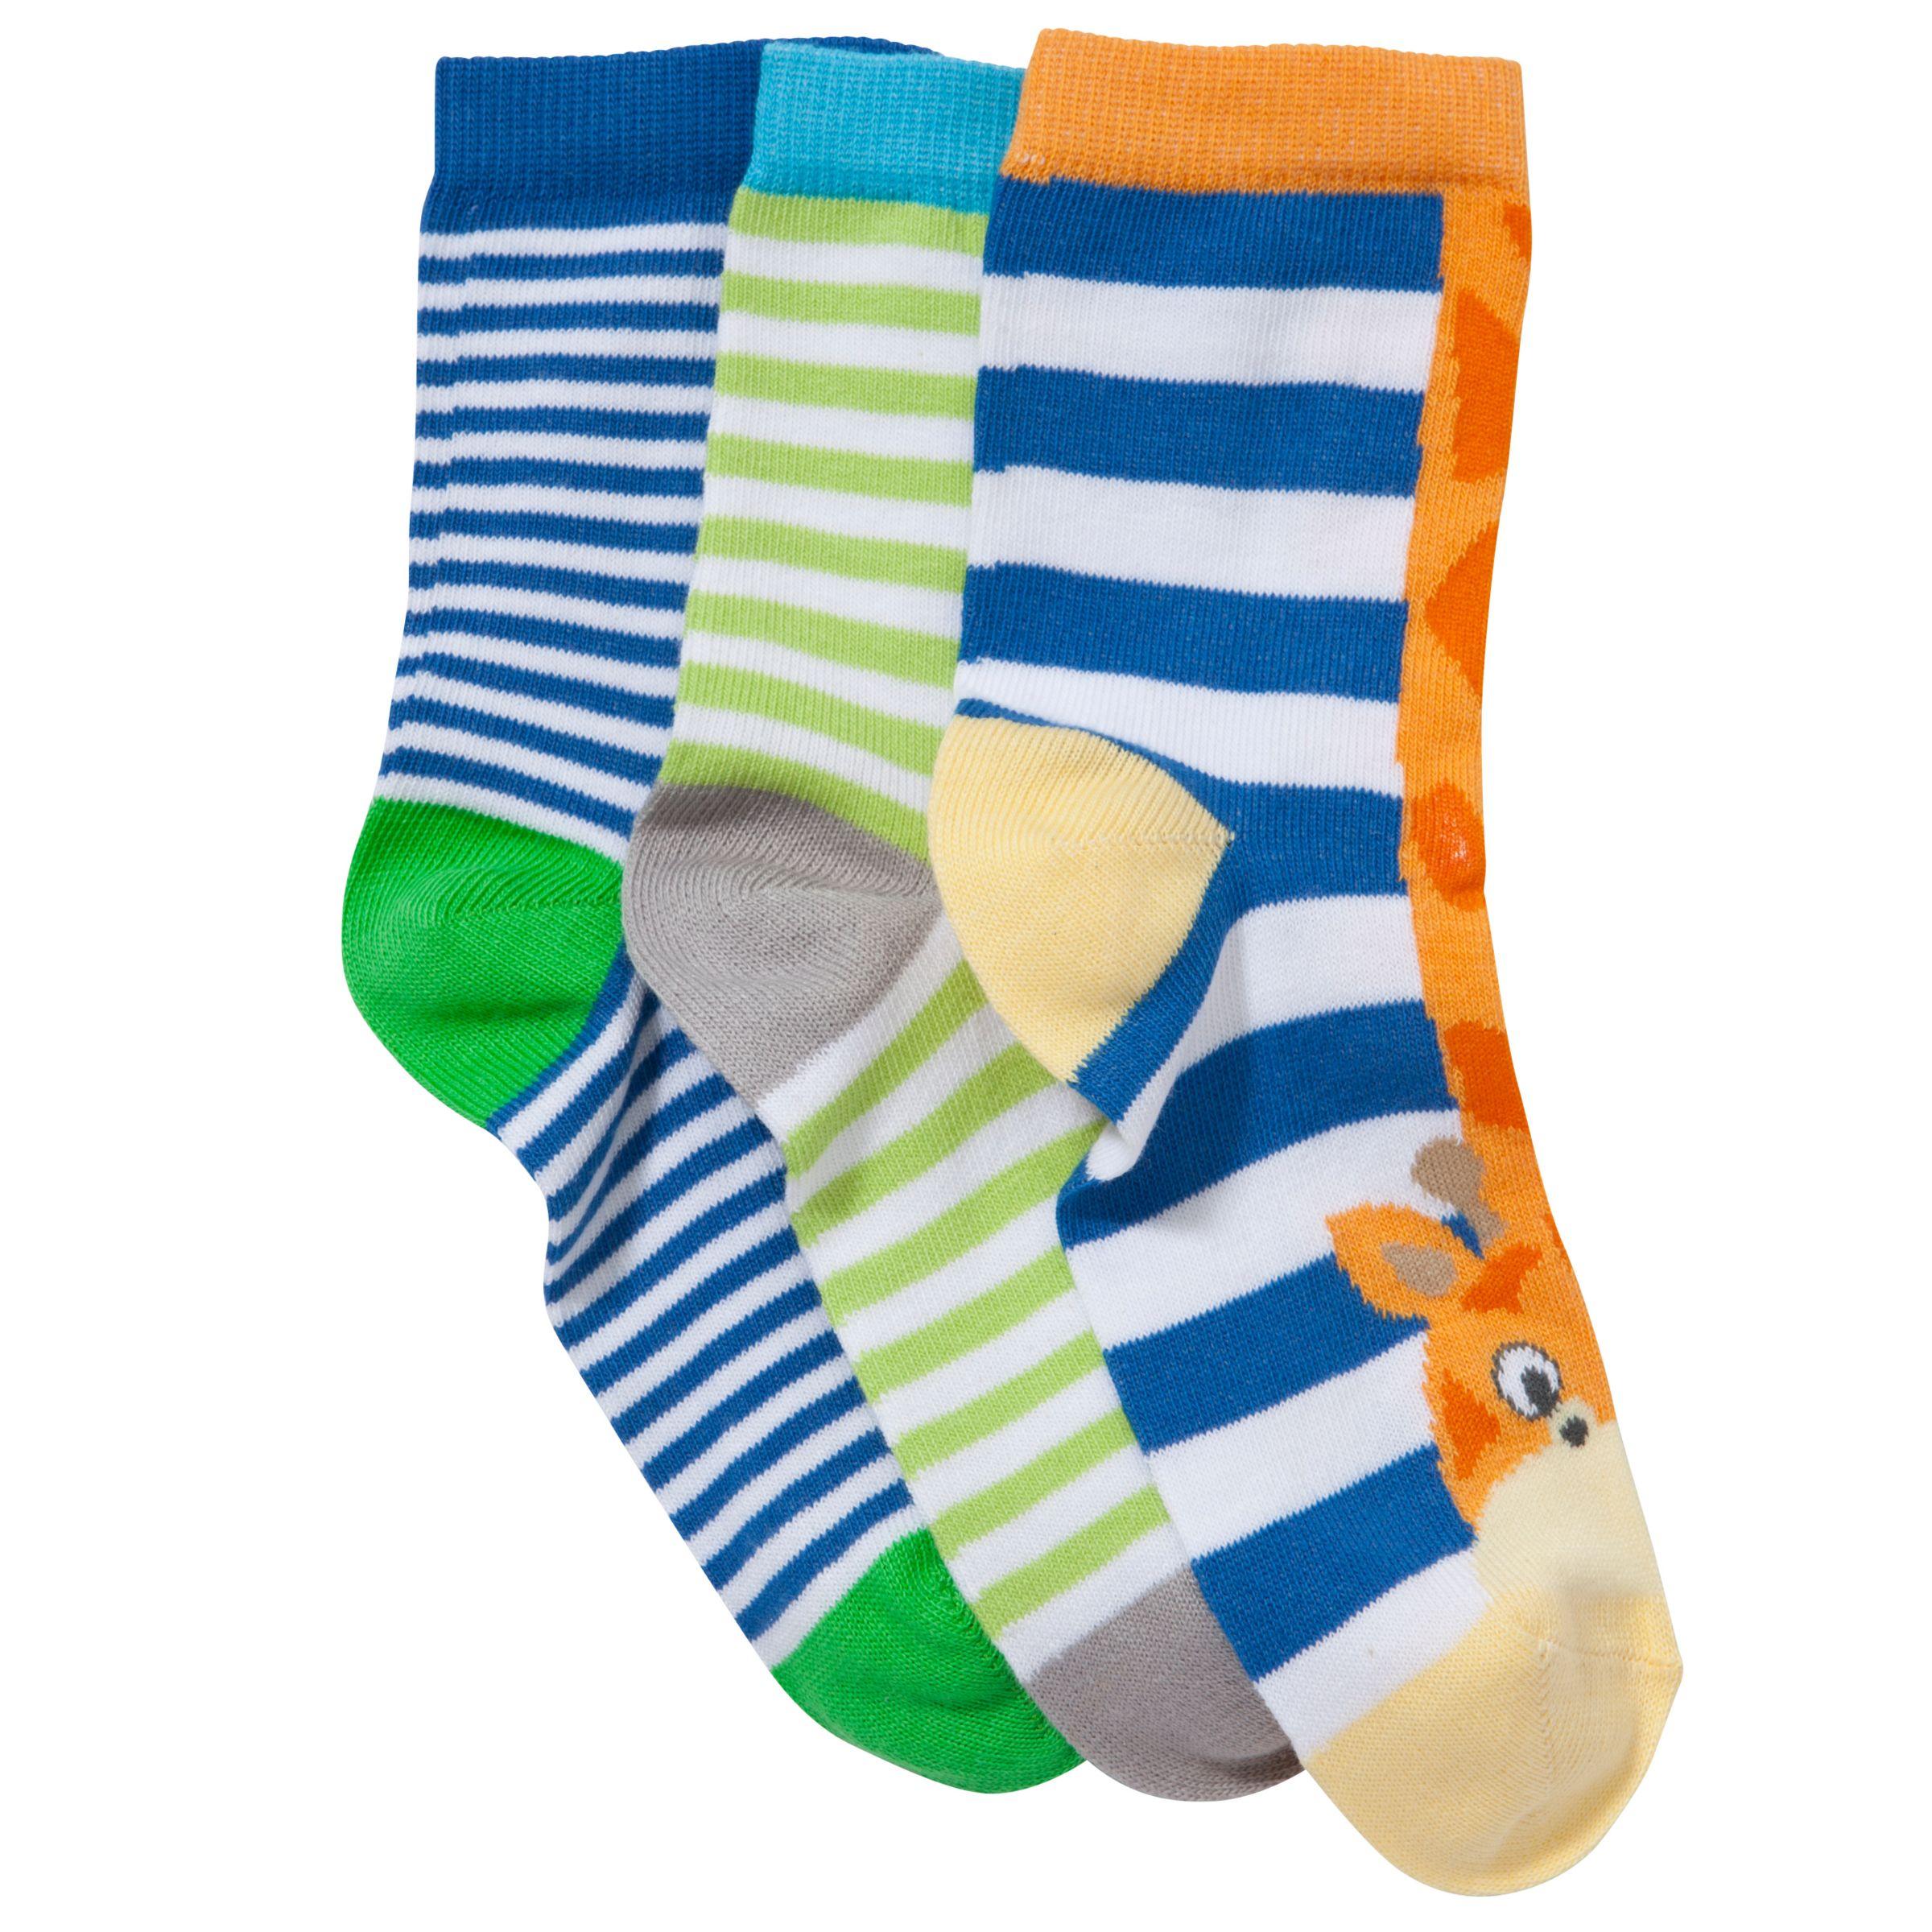 John Lewis Boy Jungle Toes Socks, Pack of 3, Multi